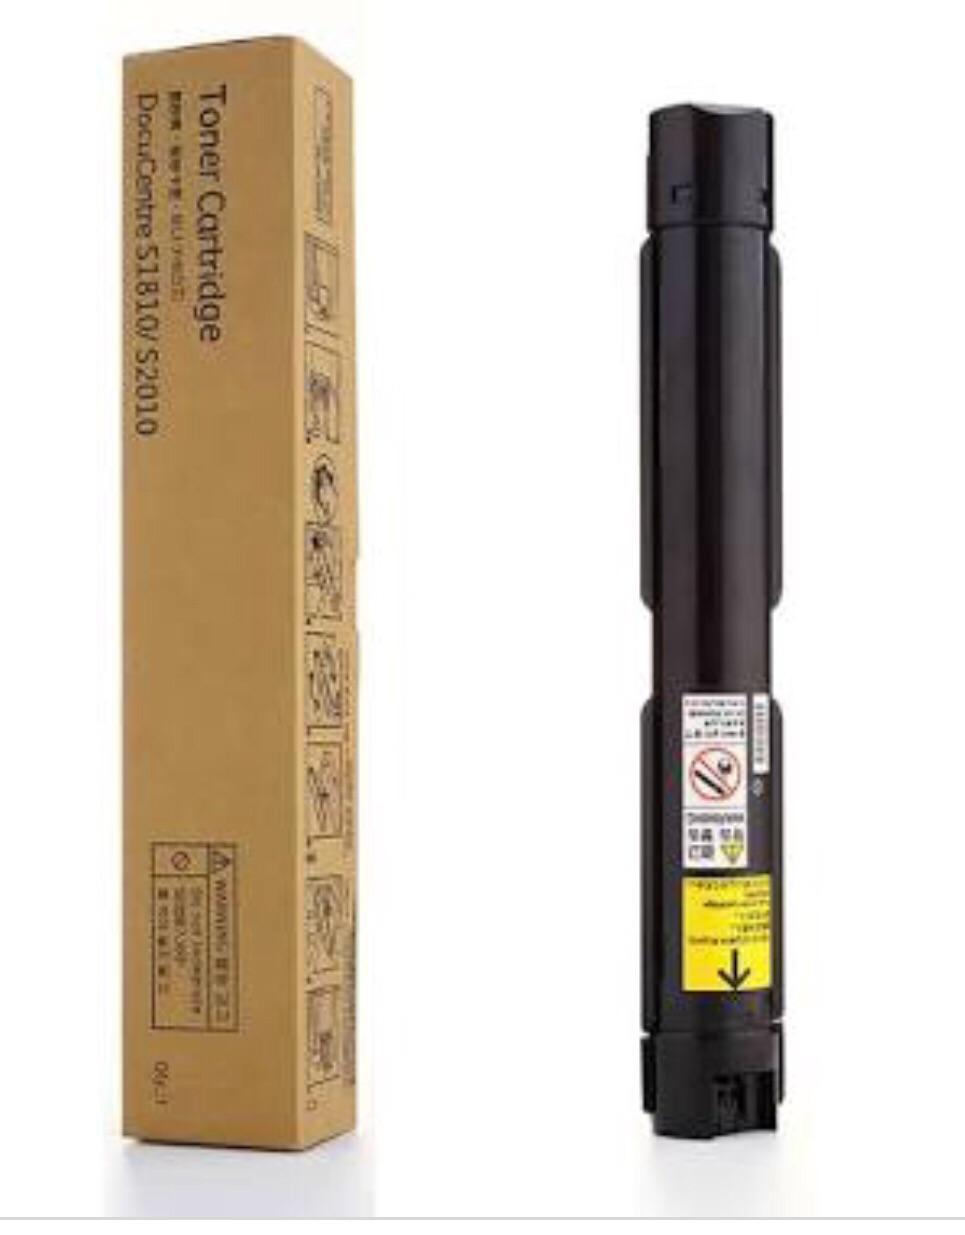 Fuji xerox toner cartridge S2110